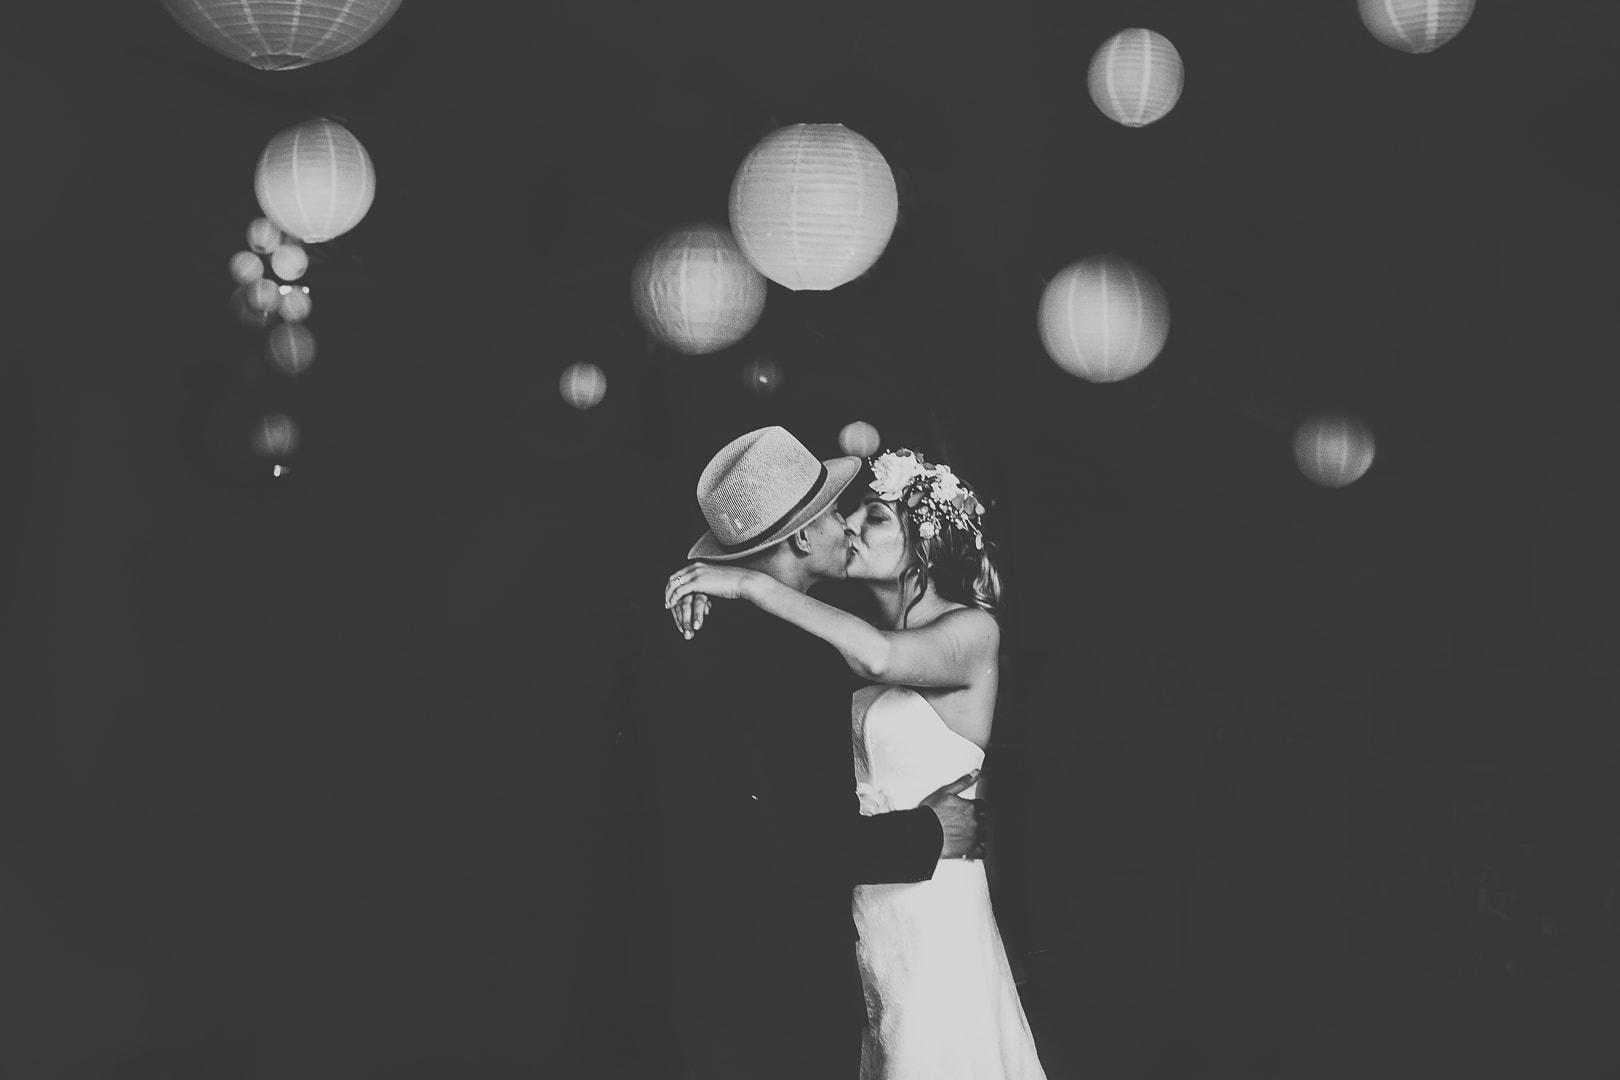 trezors-photography-photographe-professionnel-toulouse-31-mariage-reportage-photo-aurelie